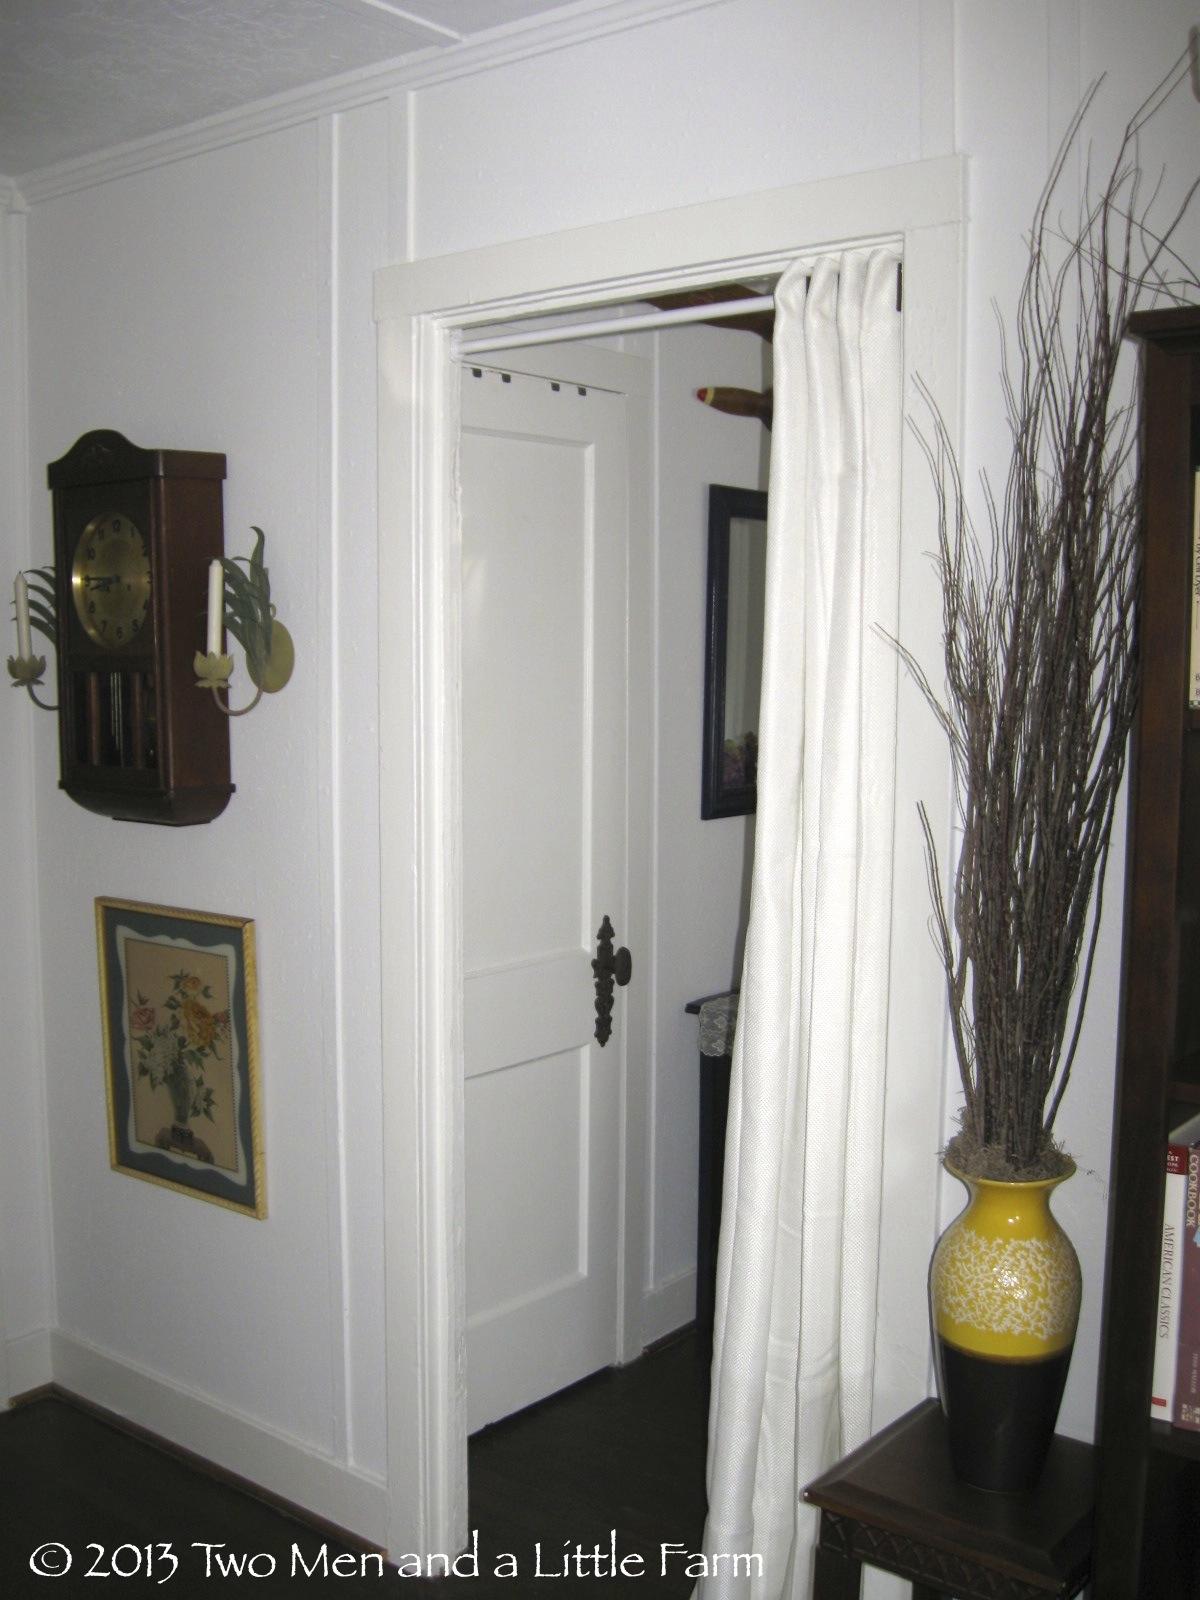 Curtain for doorway